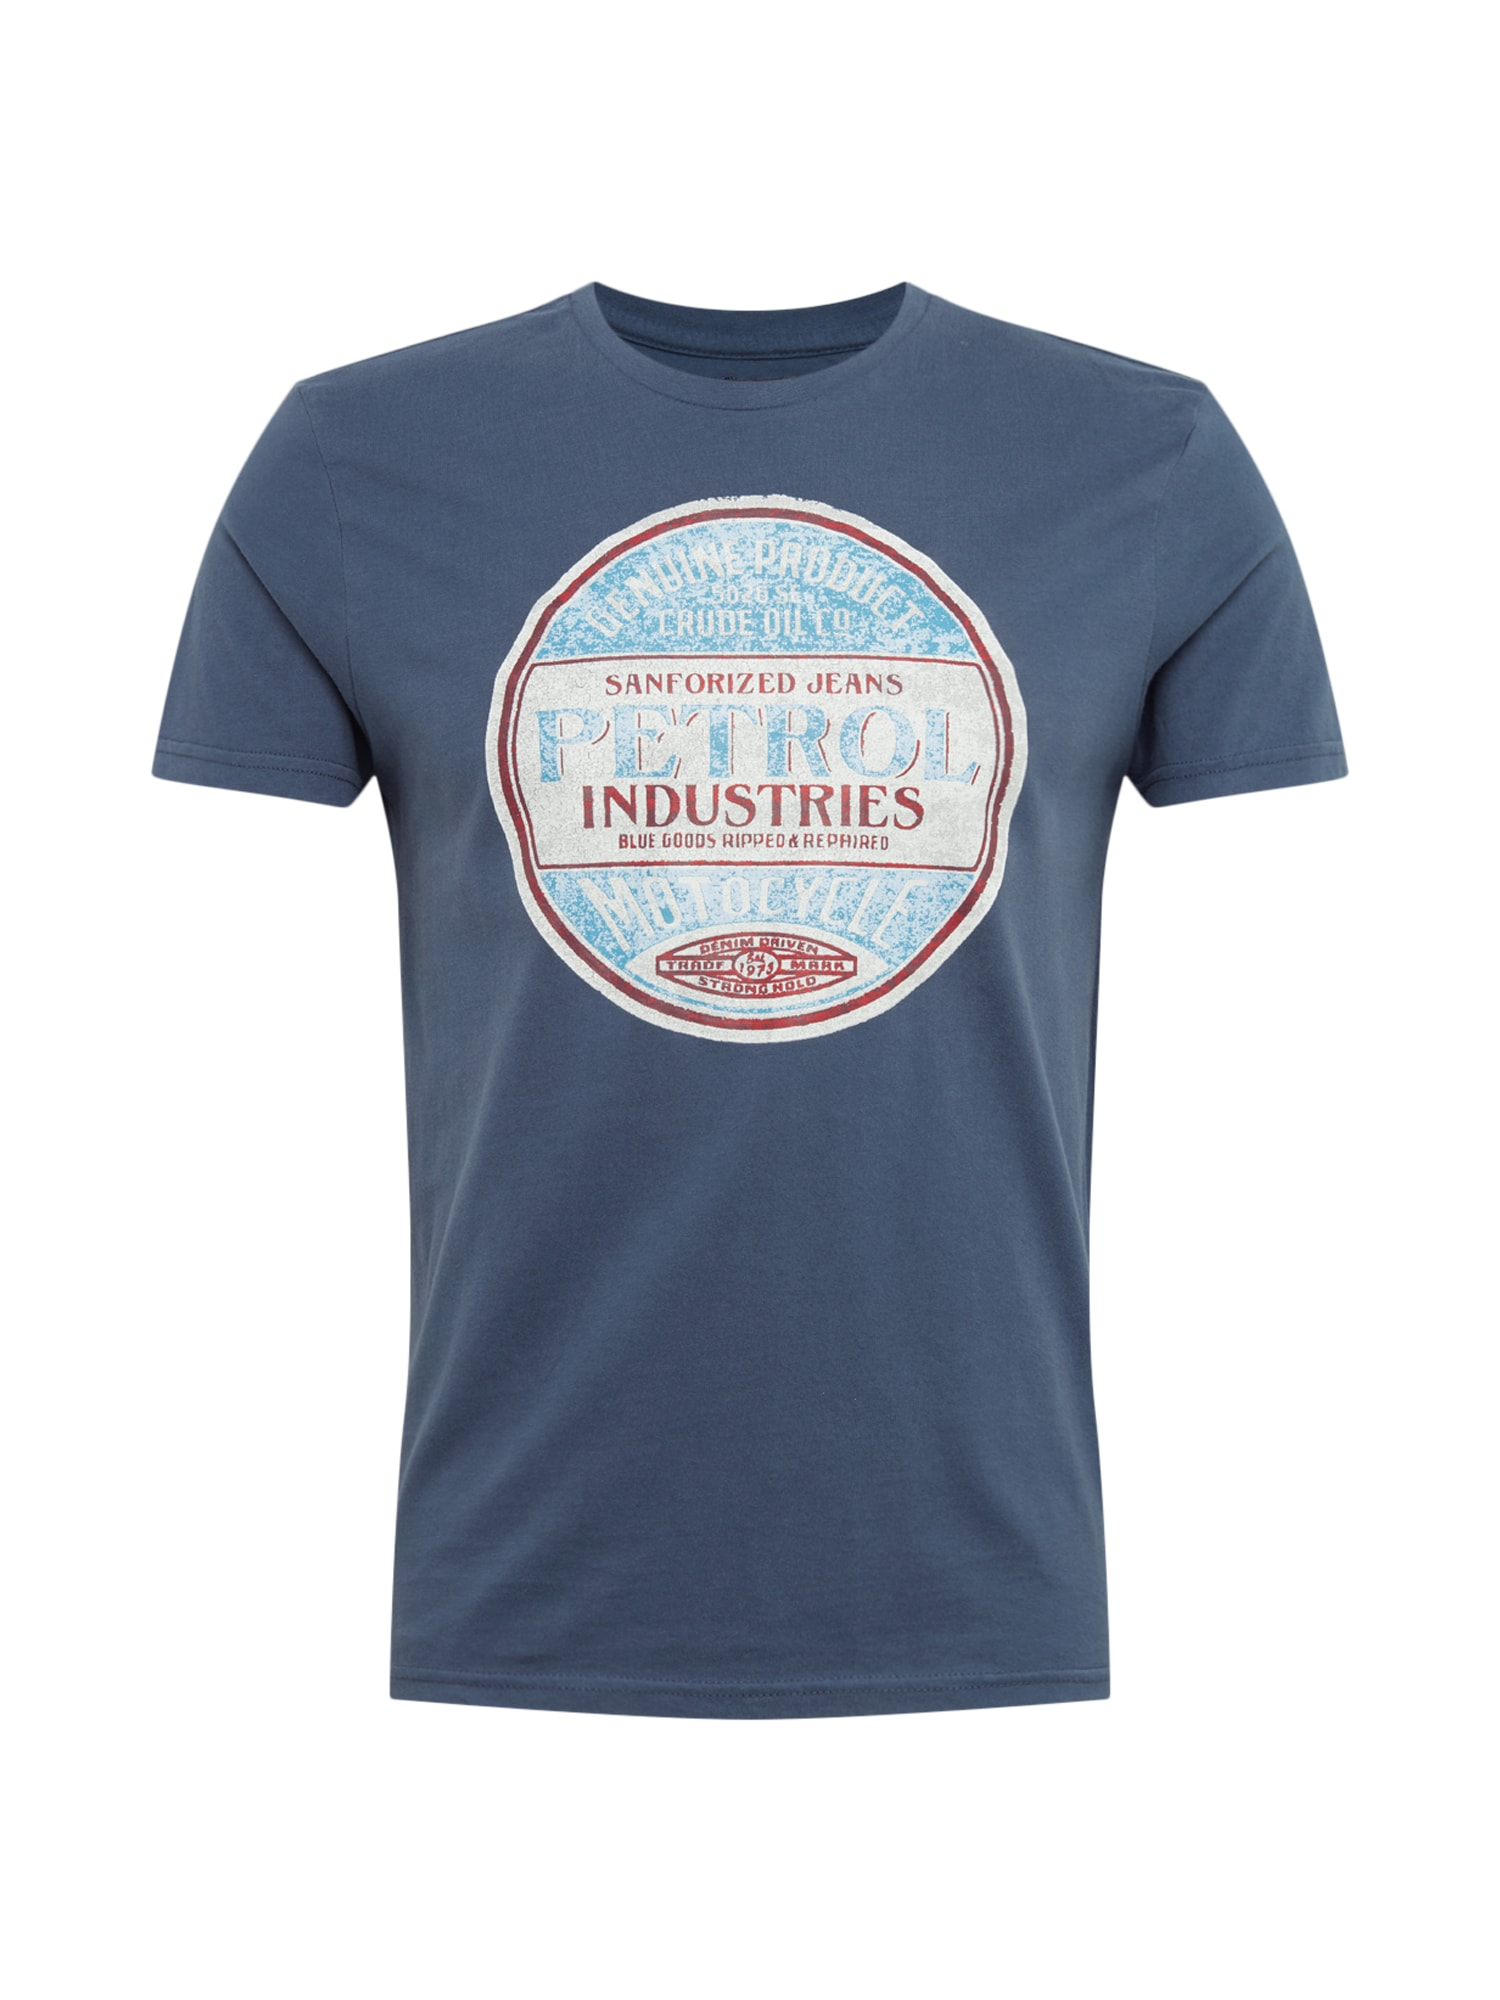 Tričko tmavě modrá Petrol Industries